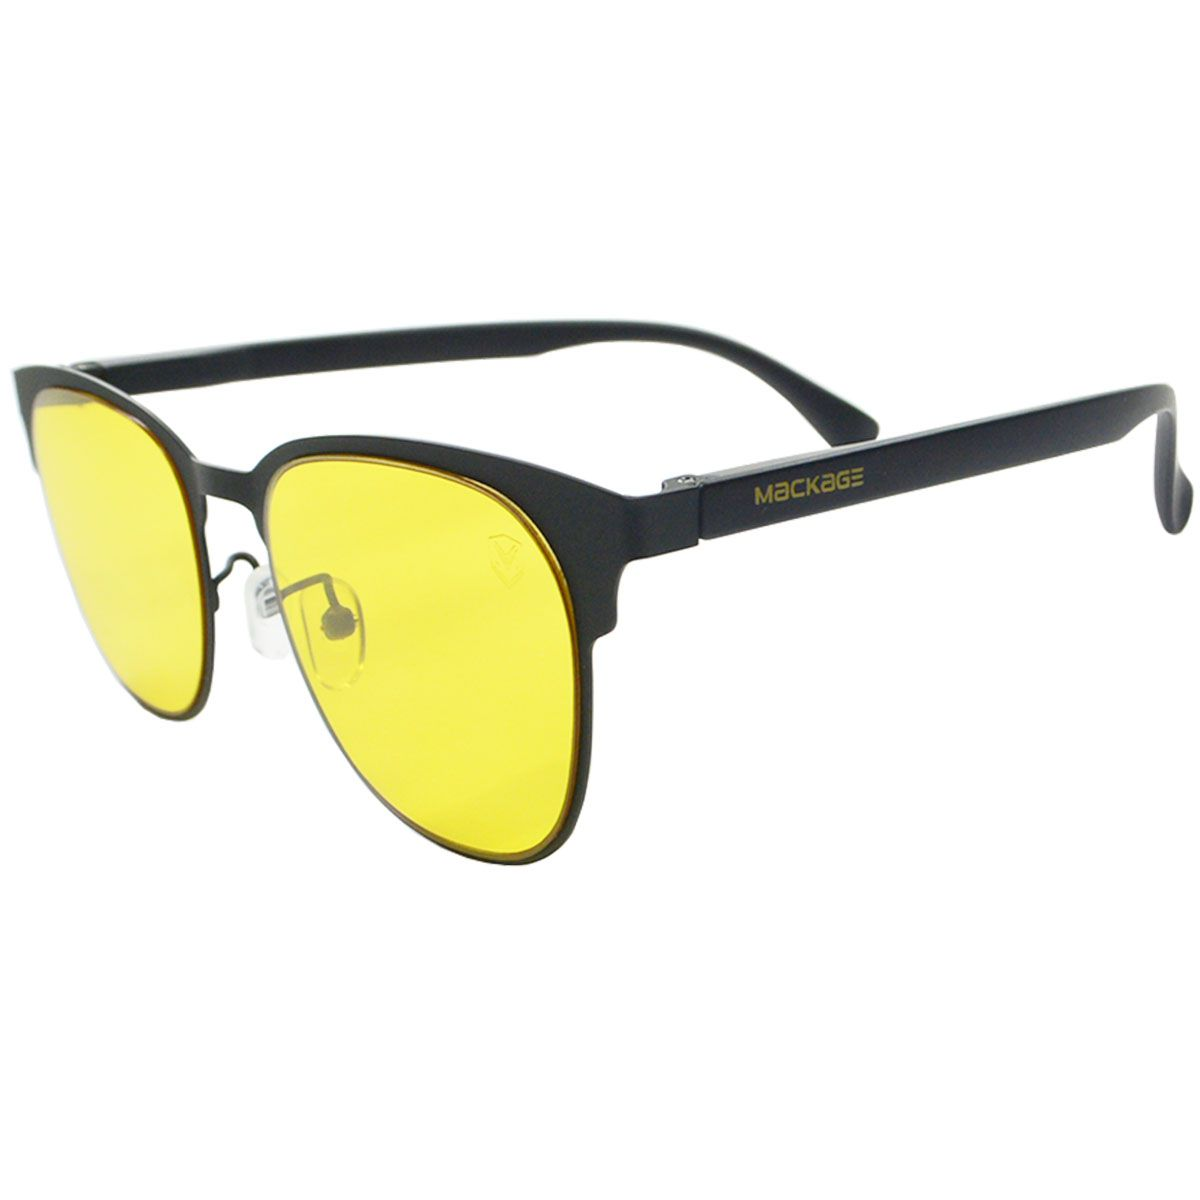 bcd74d80fb4db Óculos de sol MACKAGE BRASIL